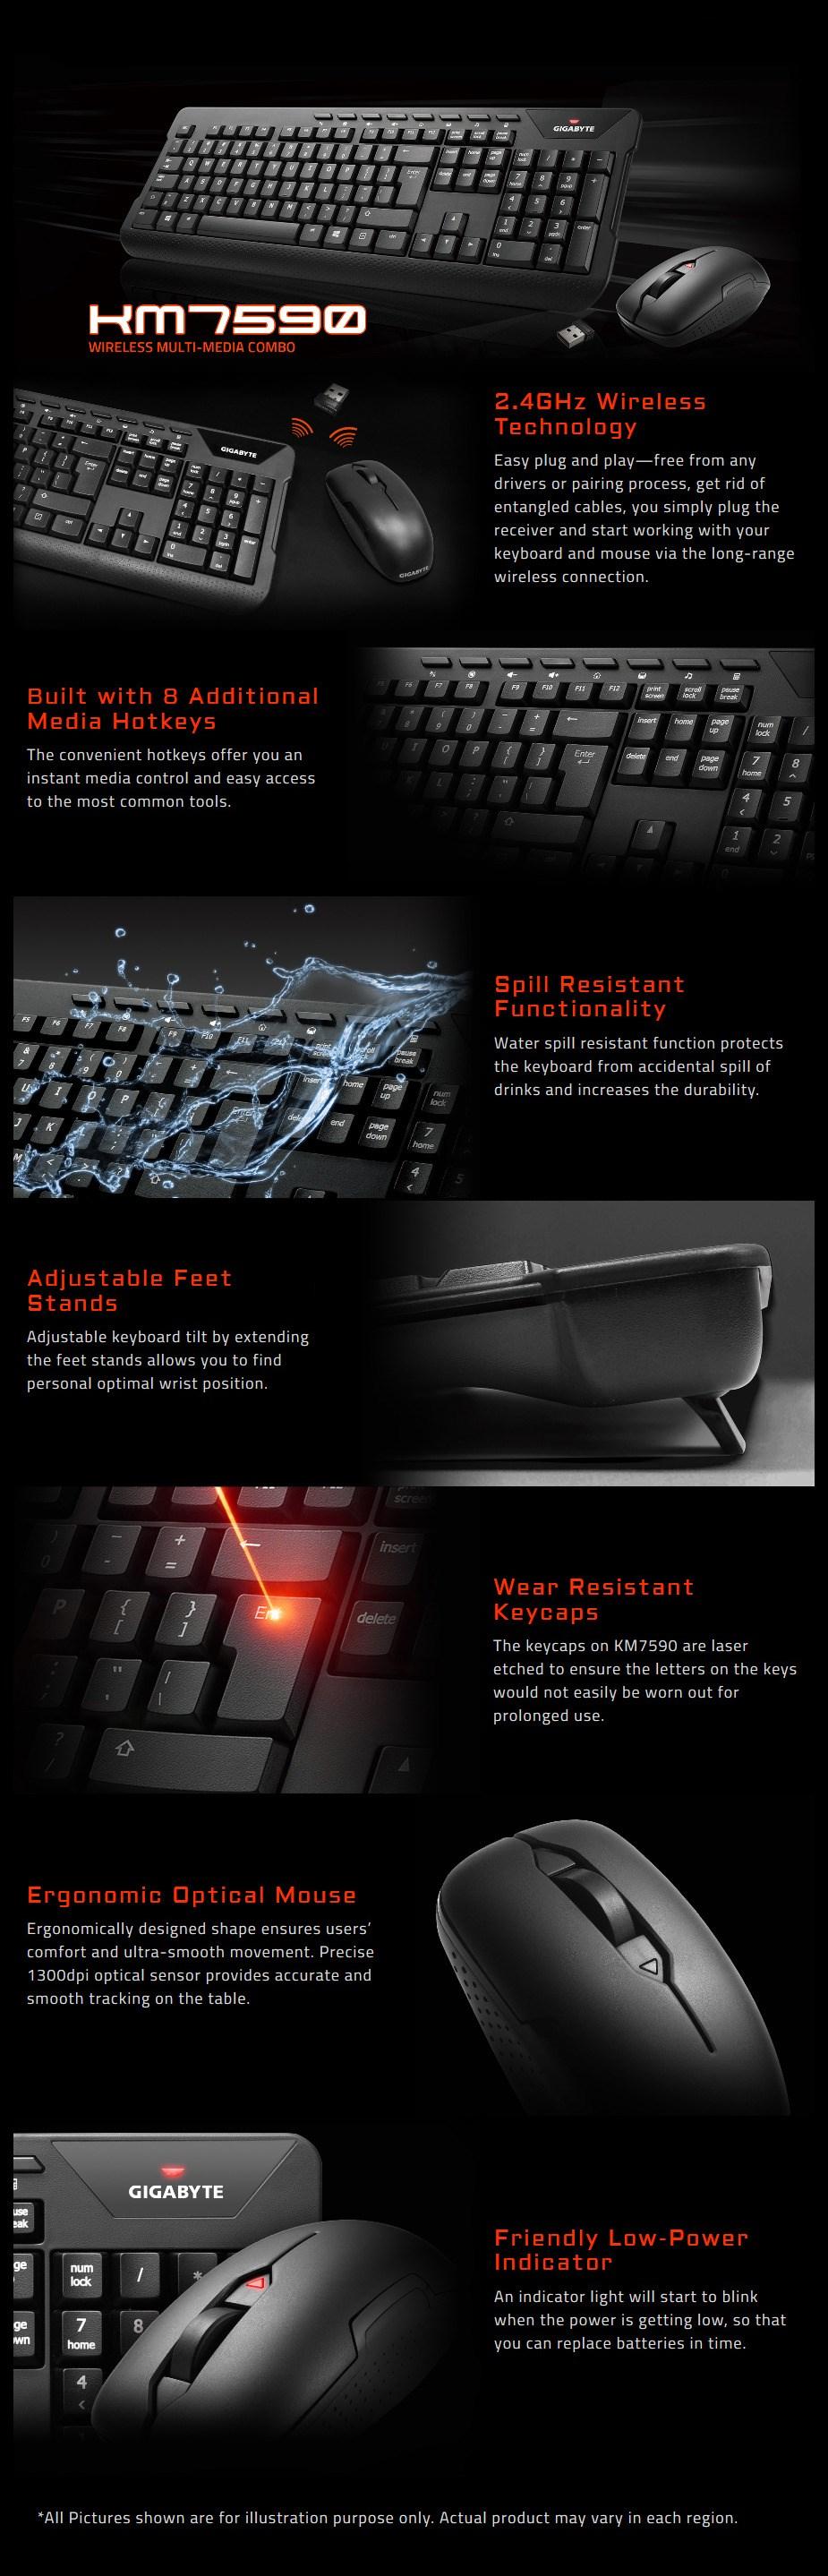 Gigabyte KM7590 Wireless Multi-Media Keyboard & Mouse Combo - Desktop Overview 1